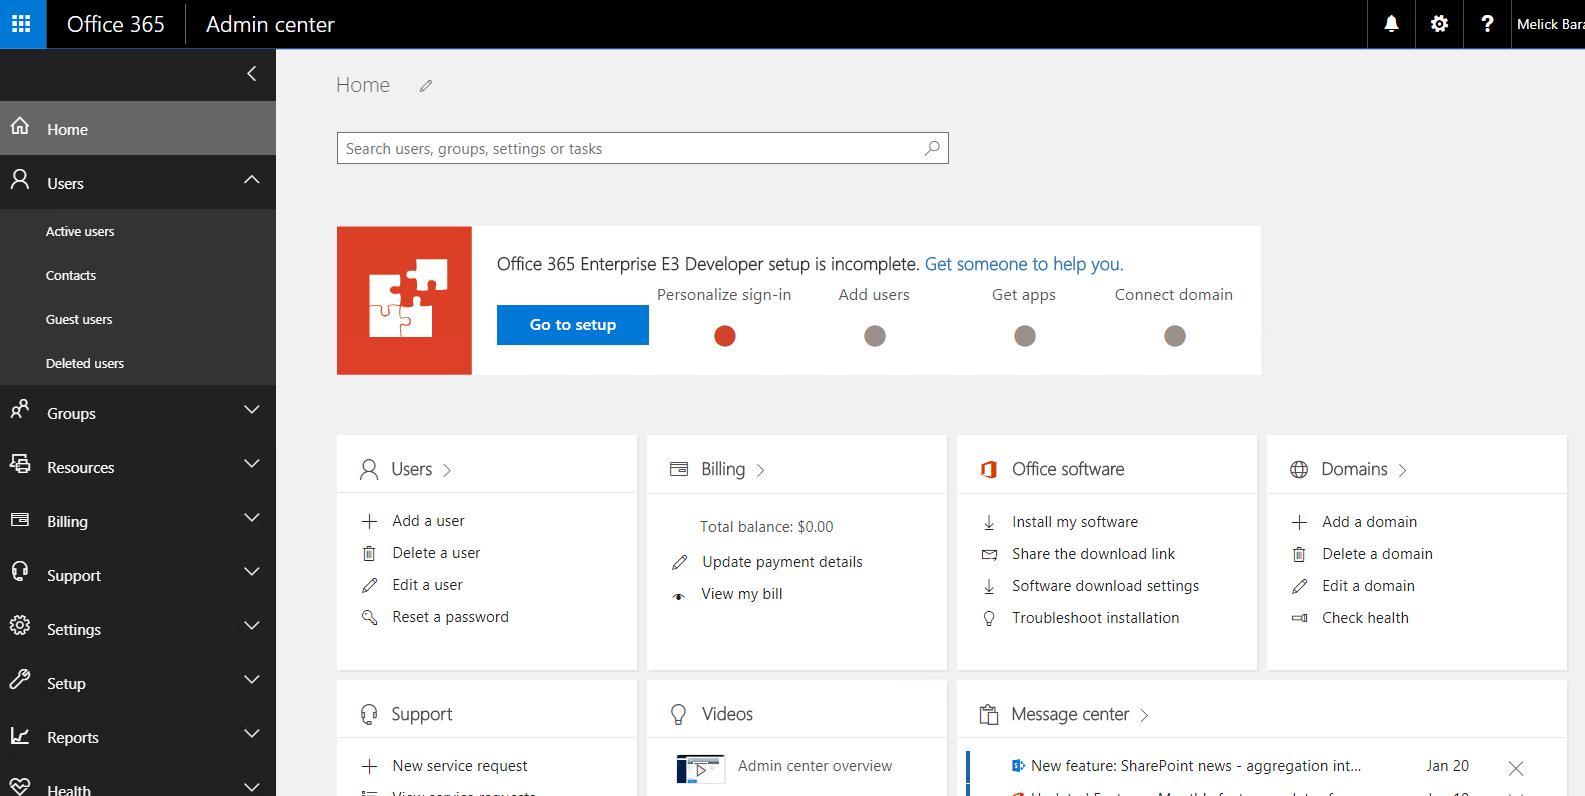 Portal.Office365